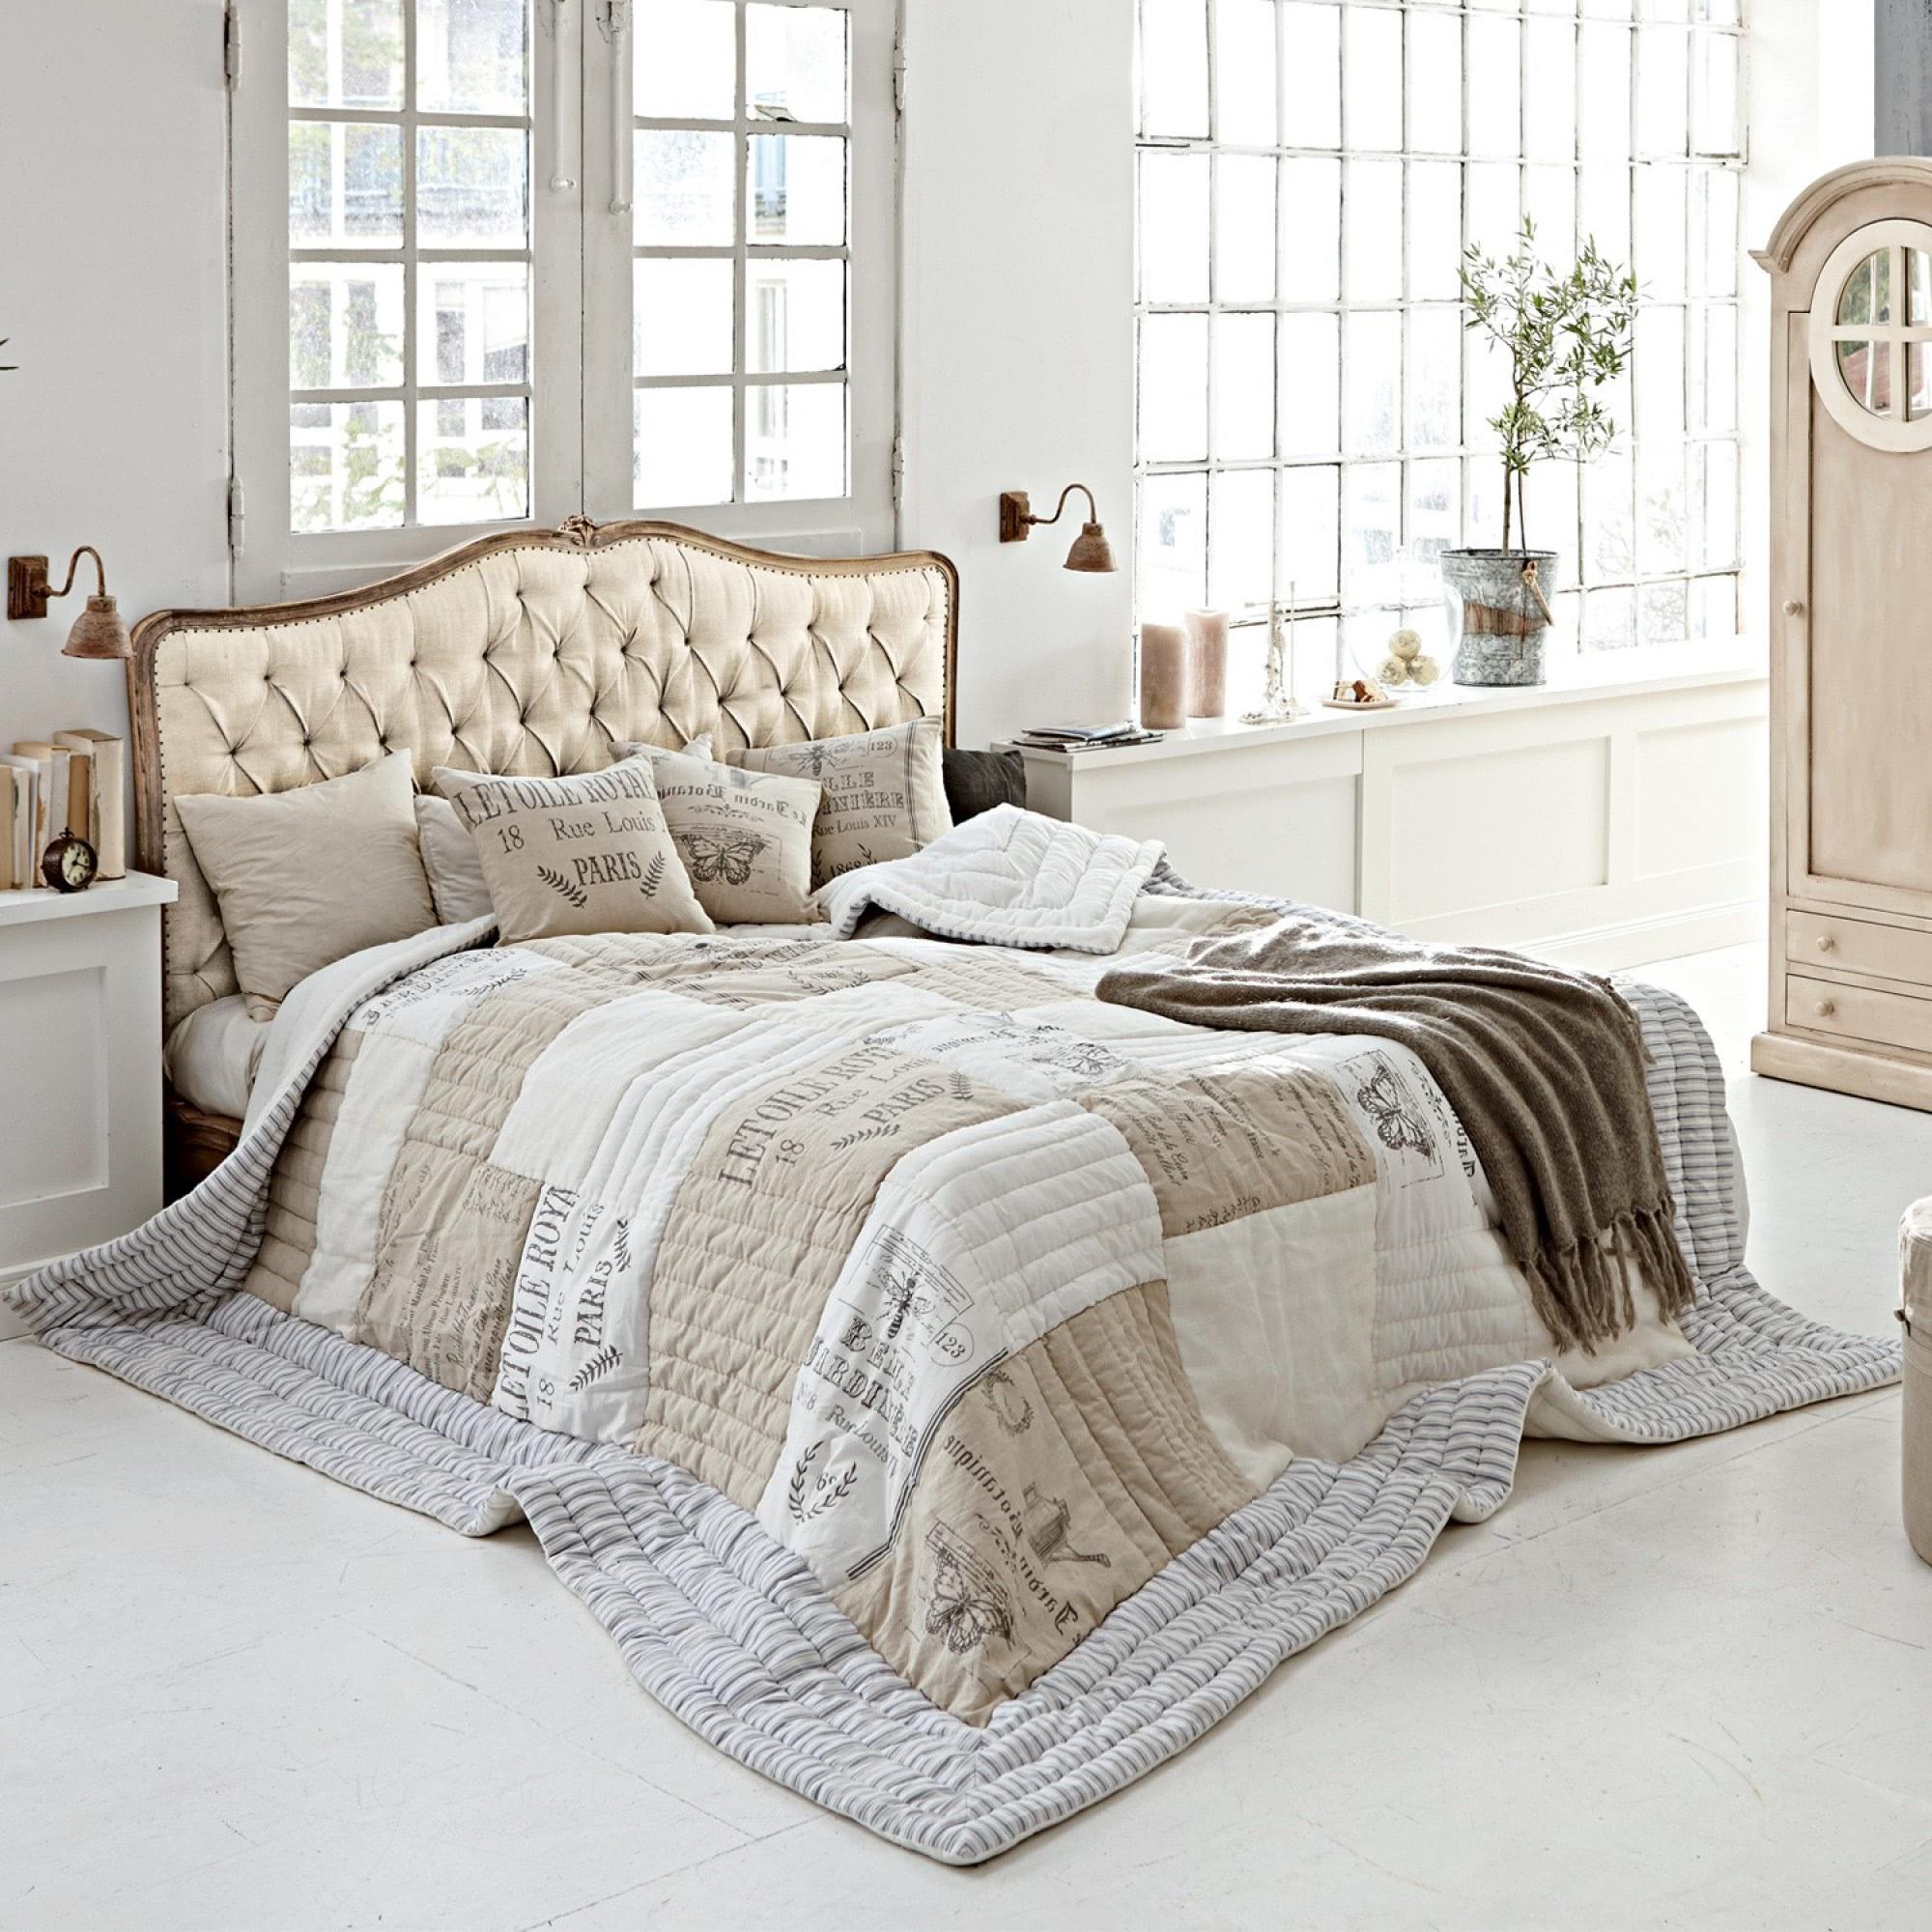 quilt framingham loberon coming home. Black Bedroom Furniture Sets. Home Design Ideas